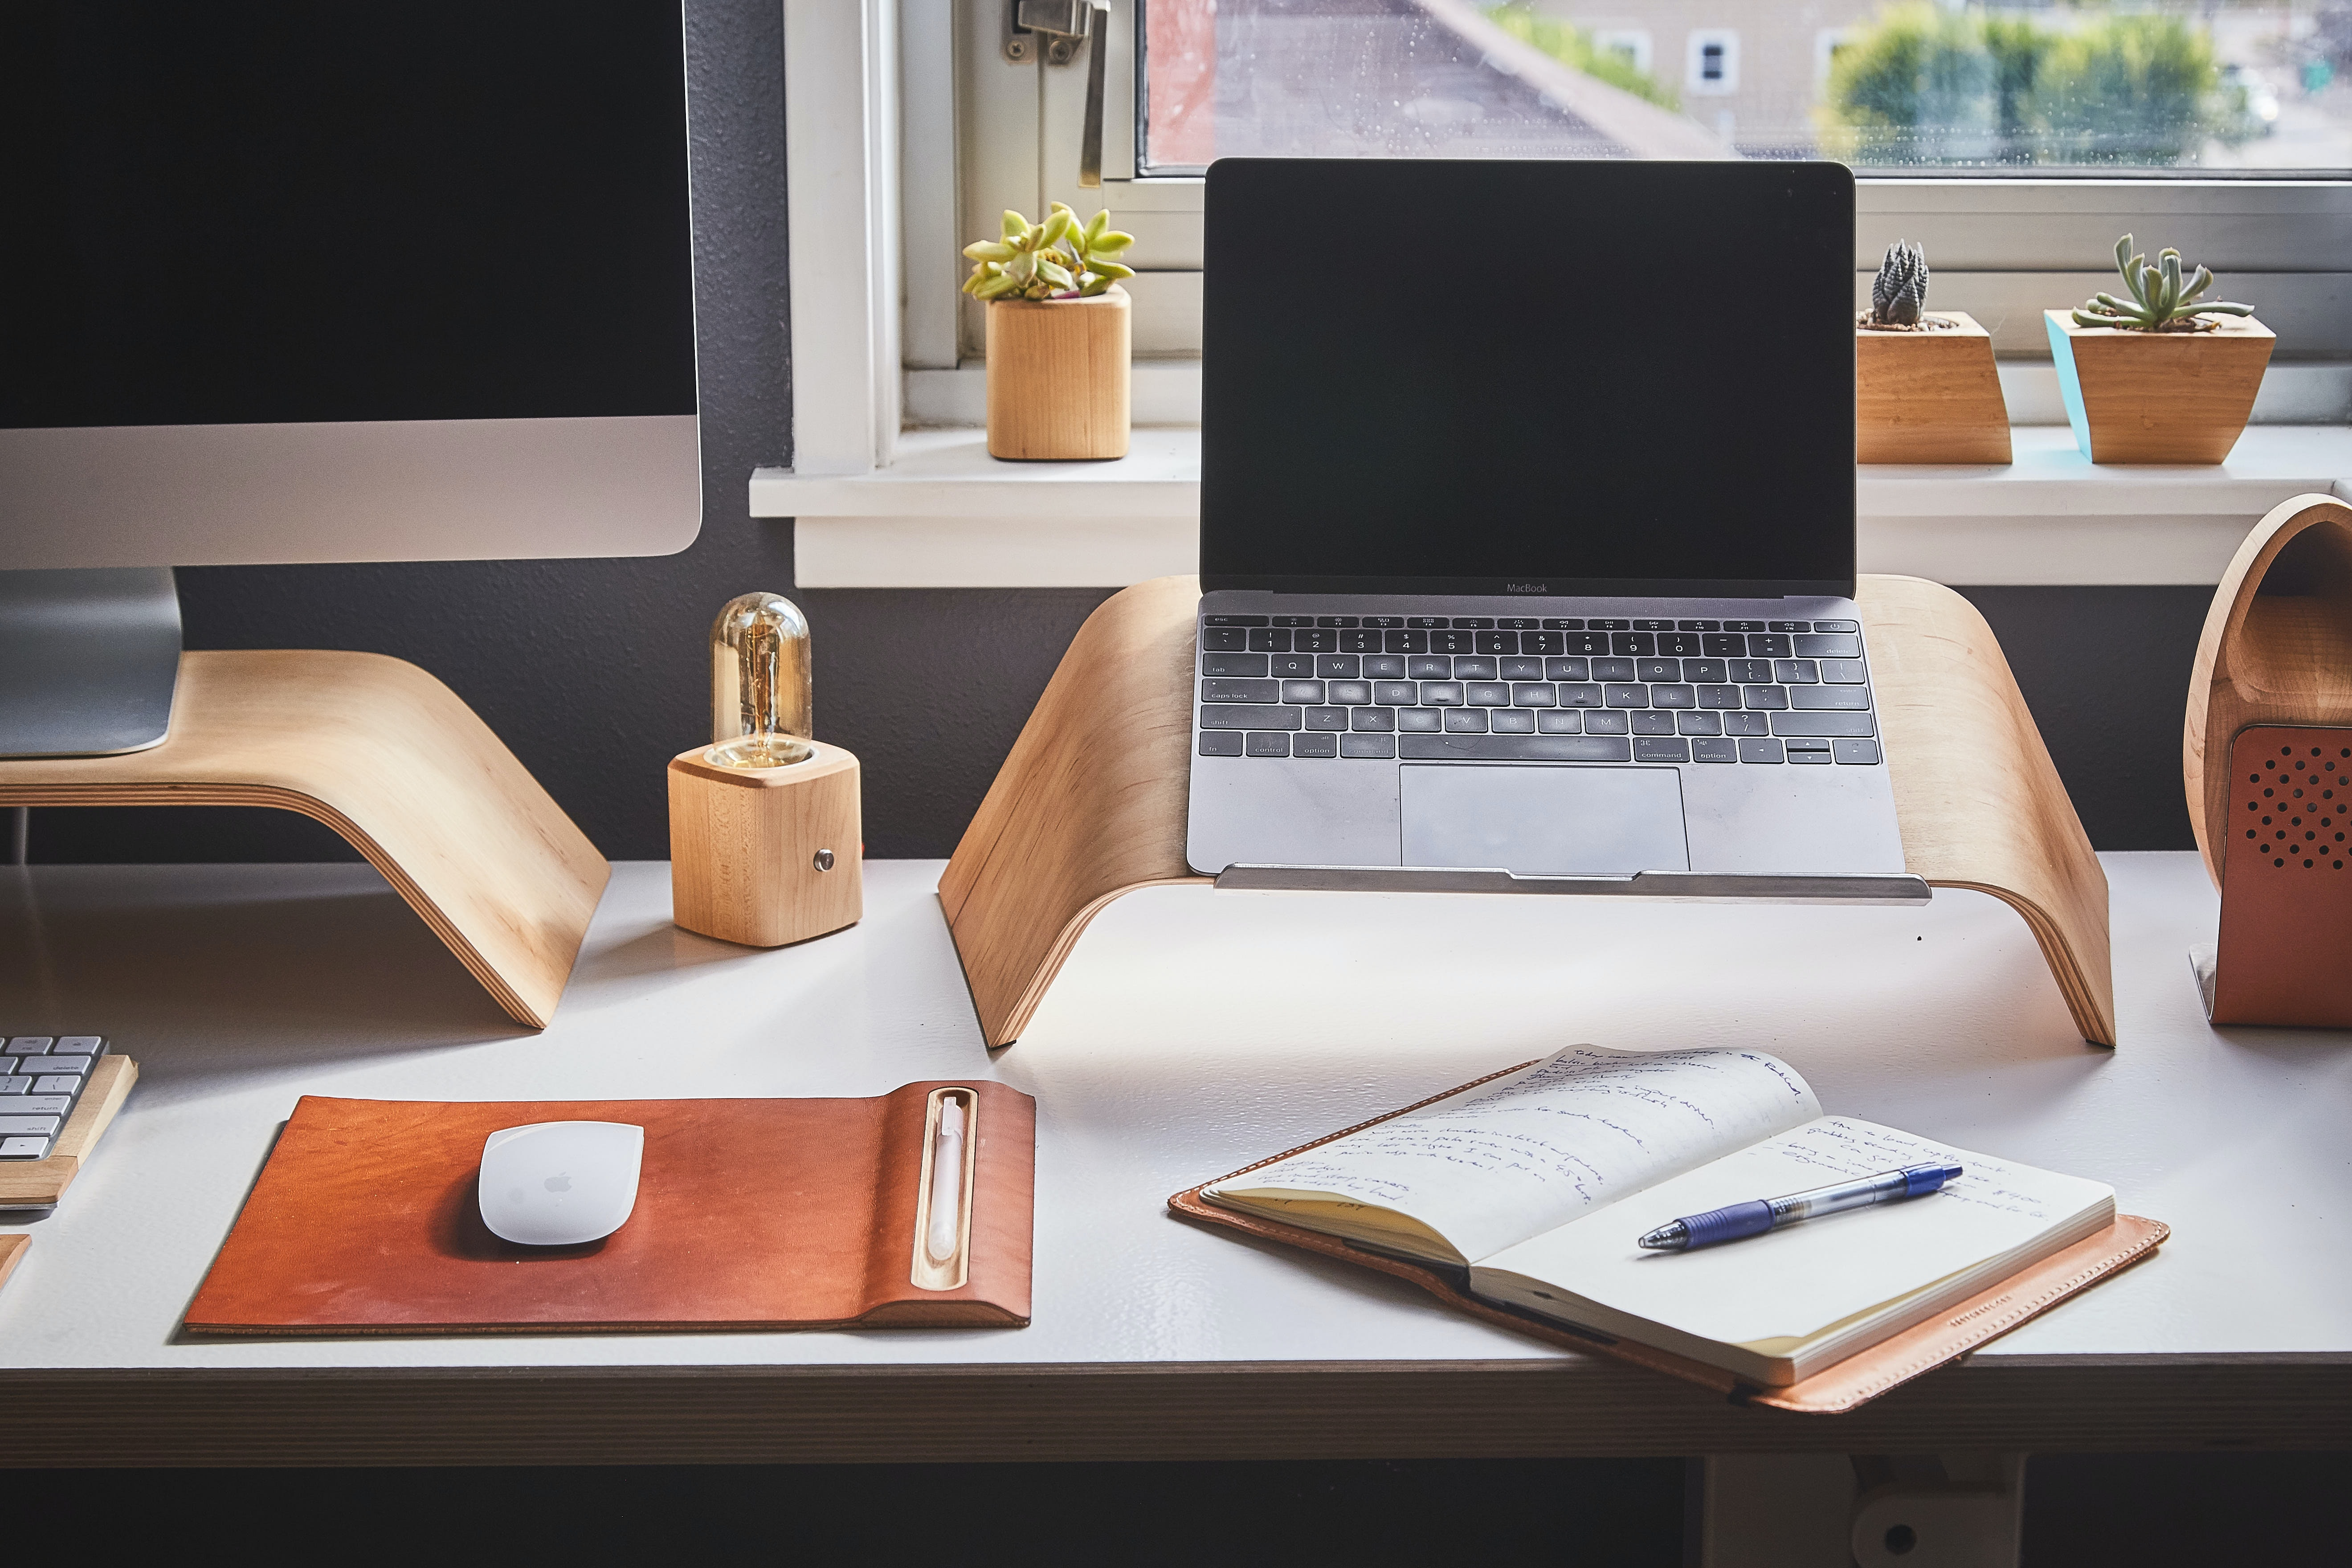 Home Office pratique et design